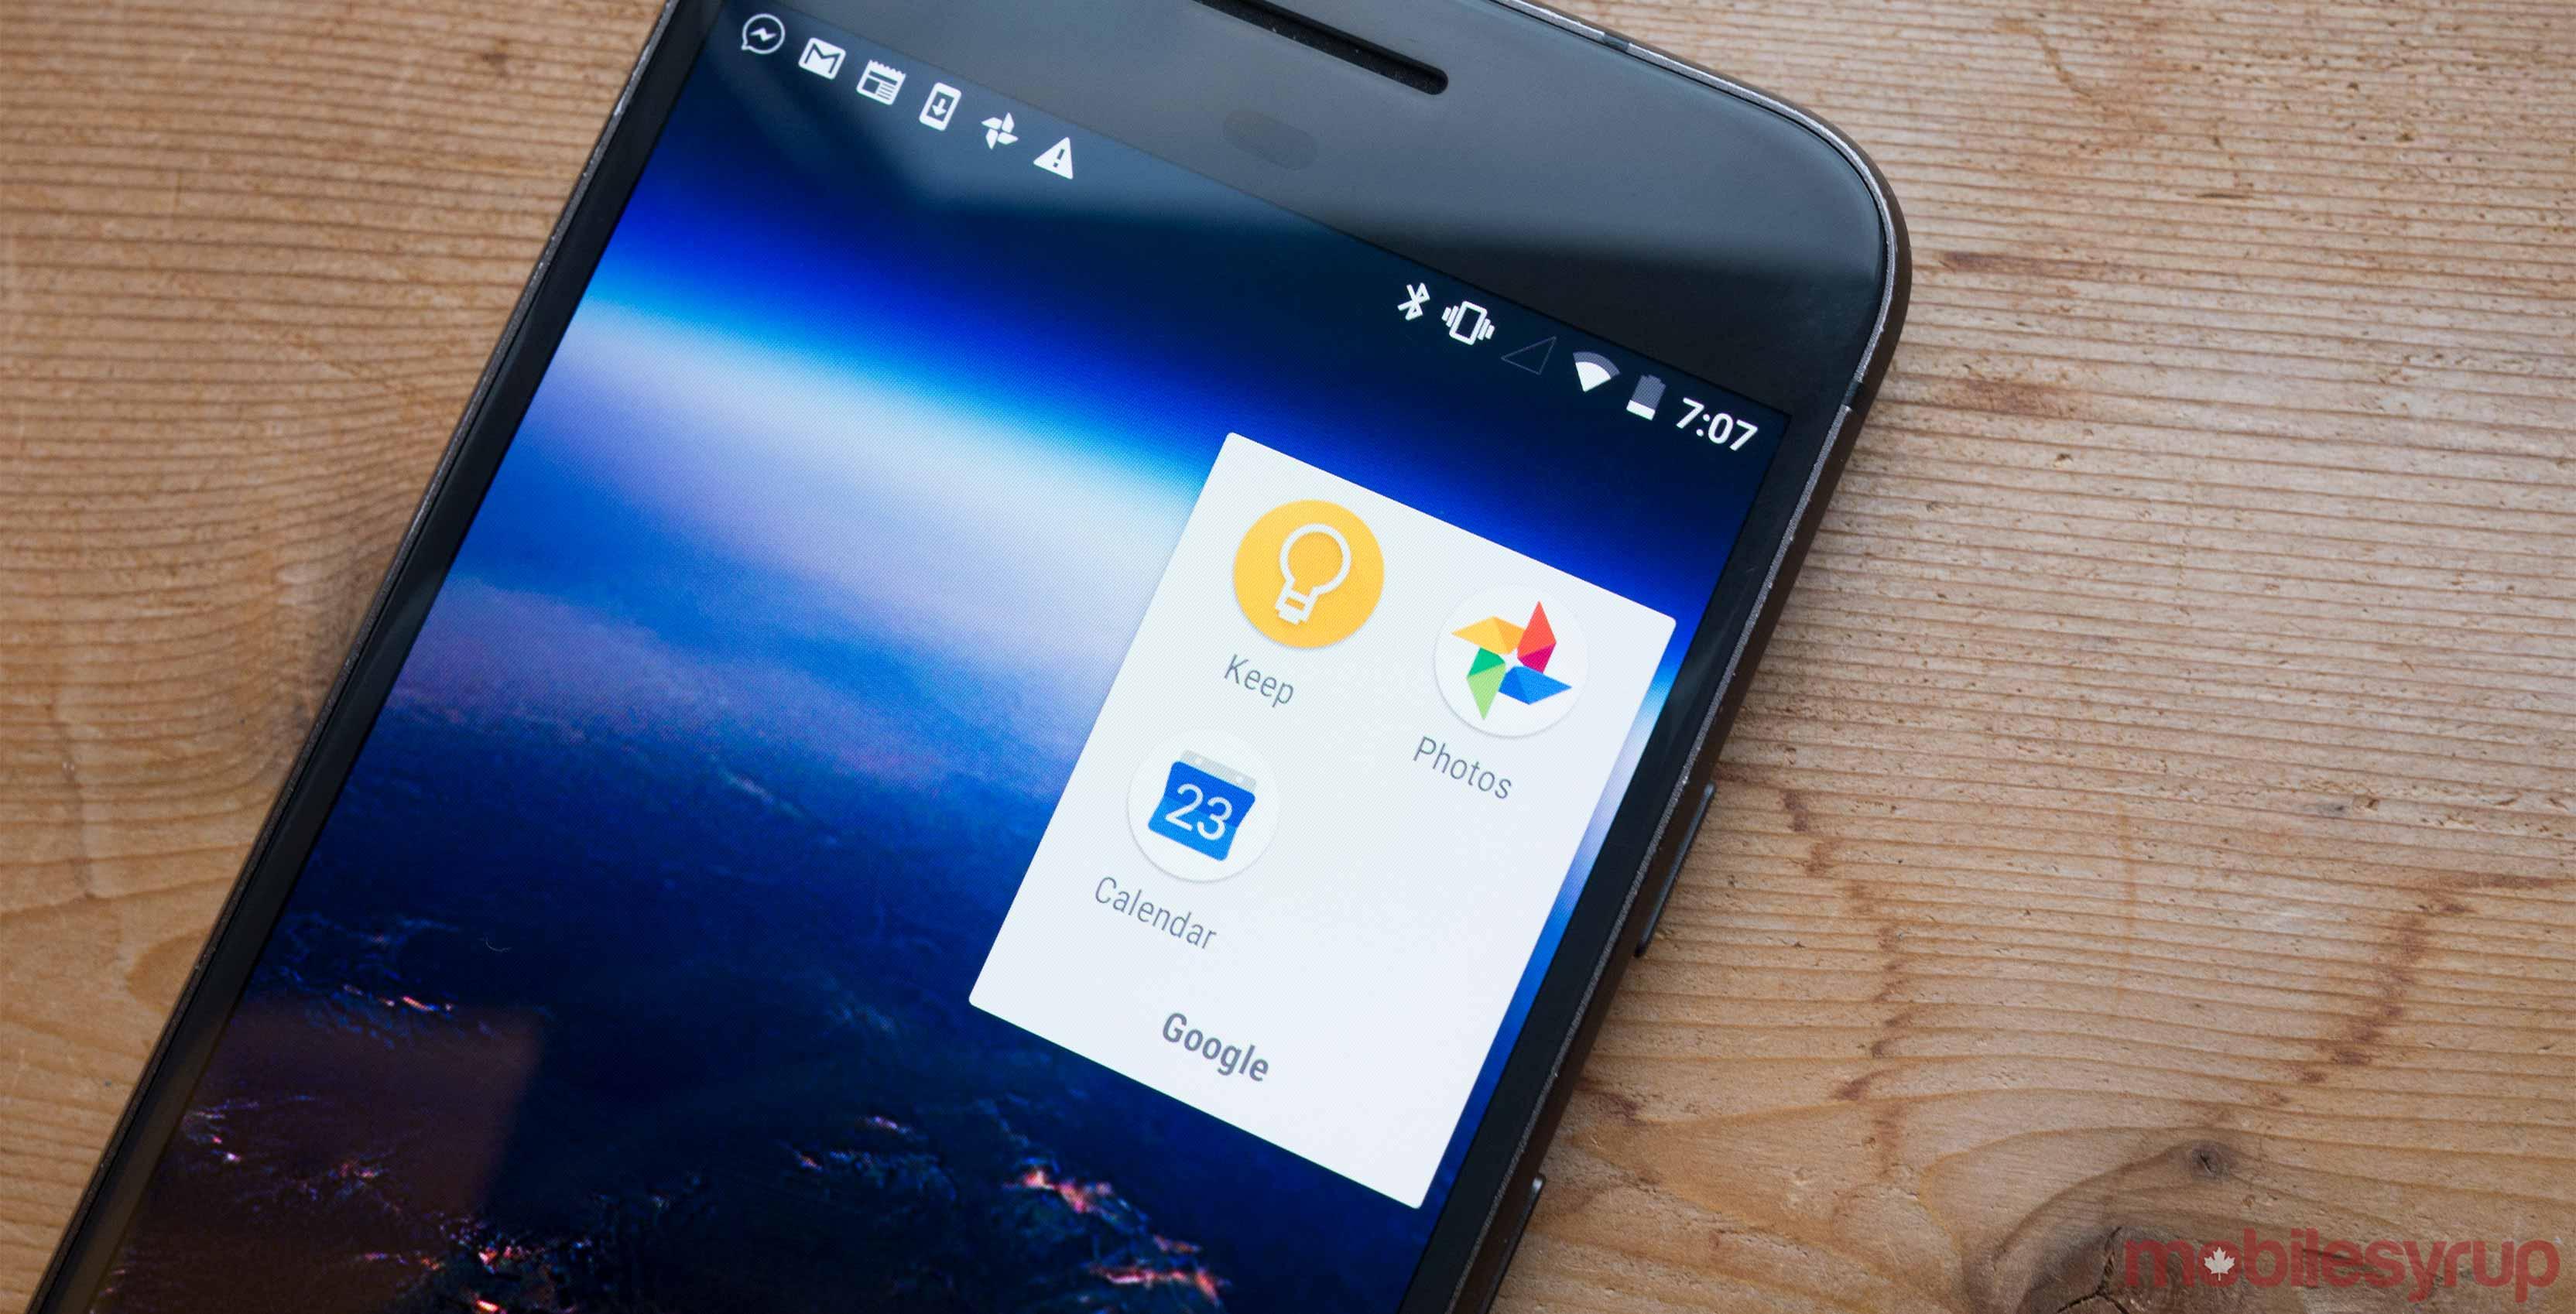 Google Photos on phone